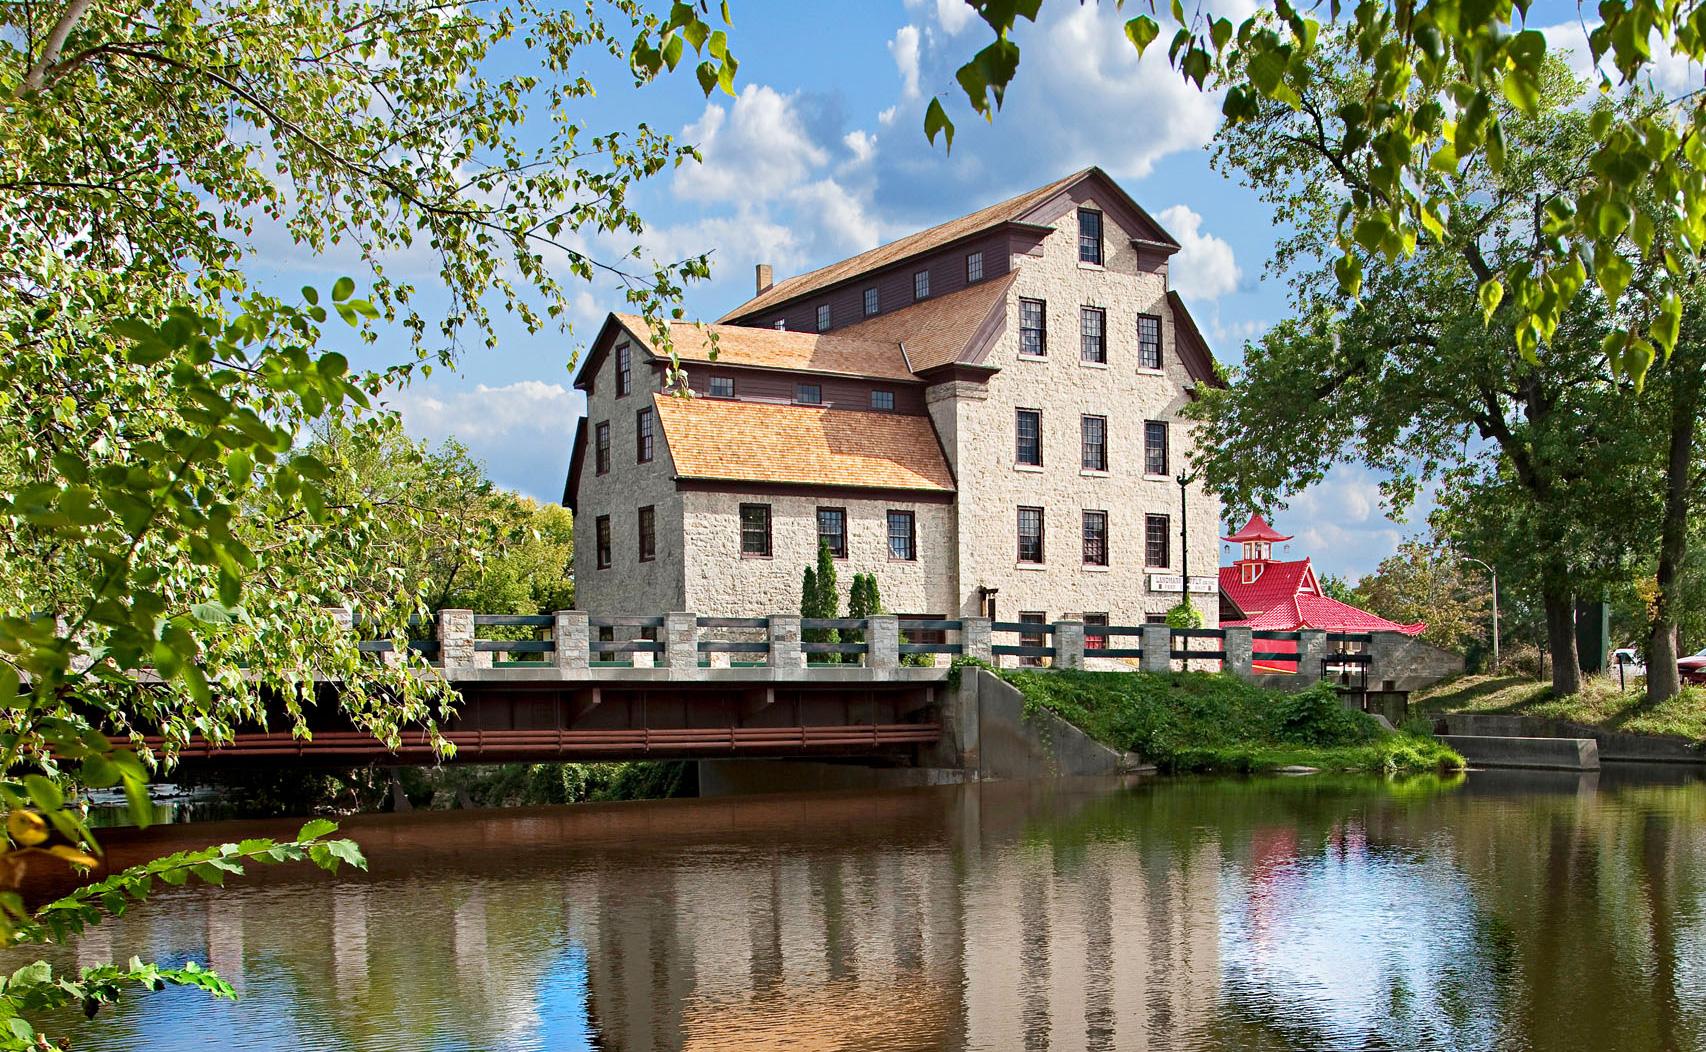 Limestone buildings create a scenic backdrop in Cedarburg.